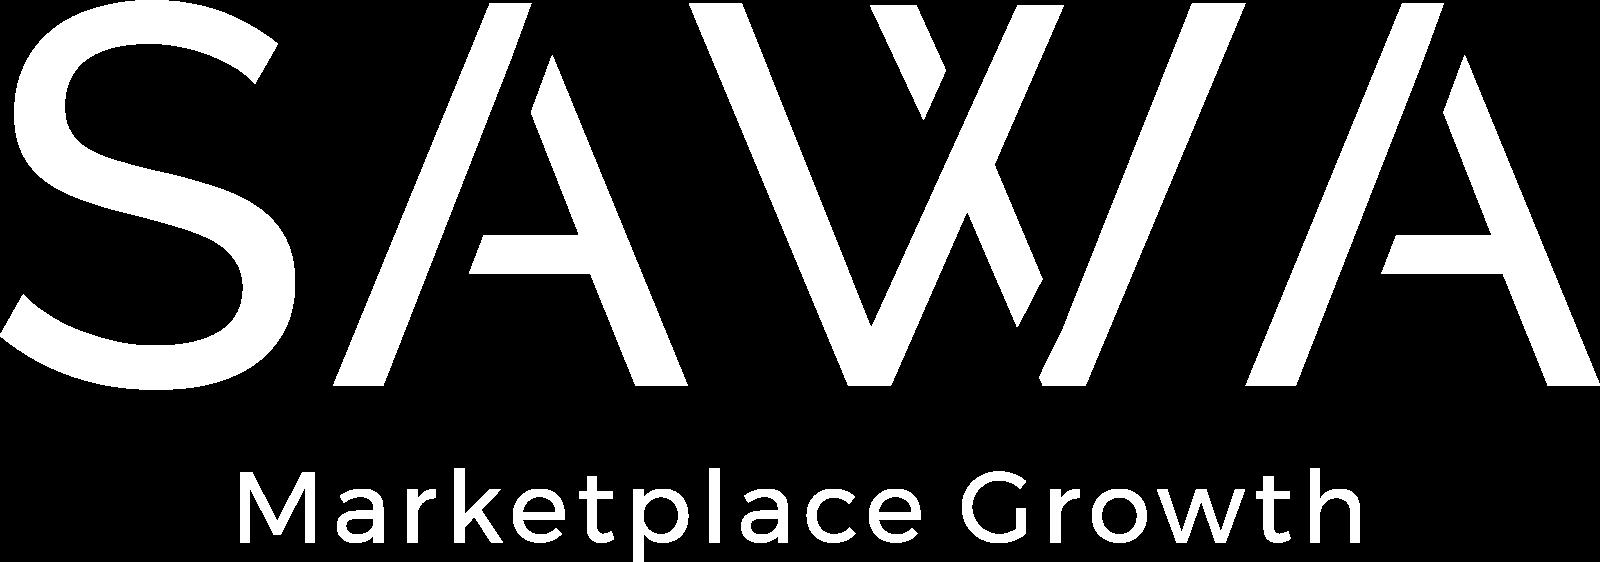 sawa-logo-transparant (1)